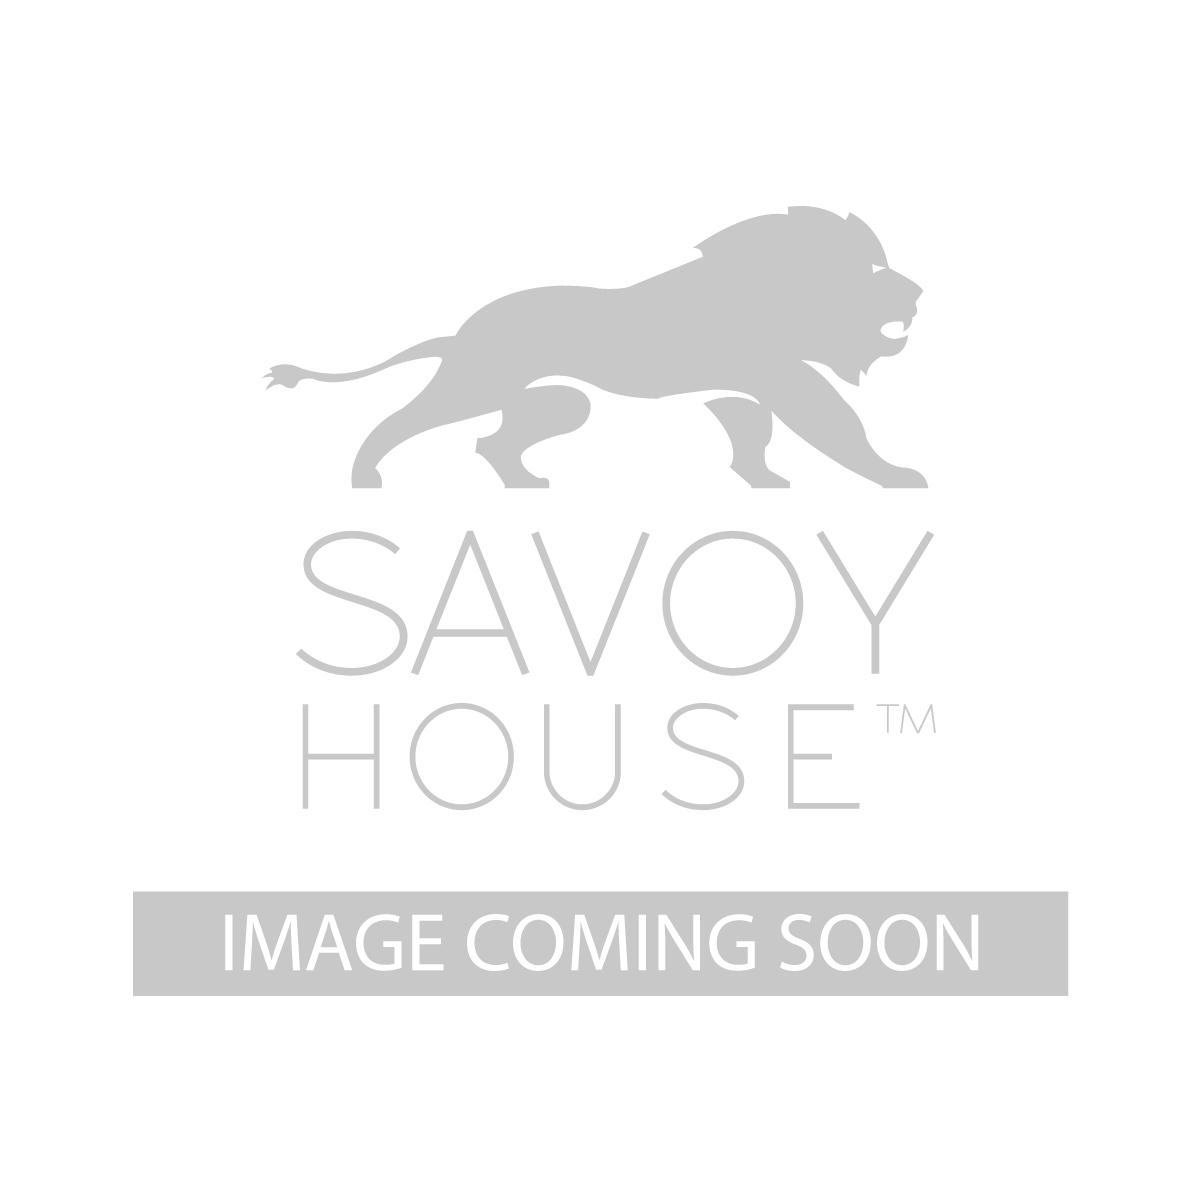 5-341-213 Brennan Outdoor Wall Lantern by Savoy House